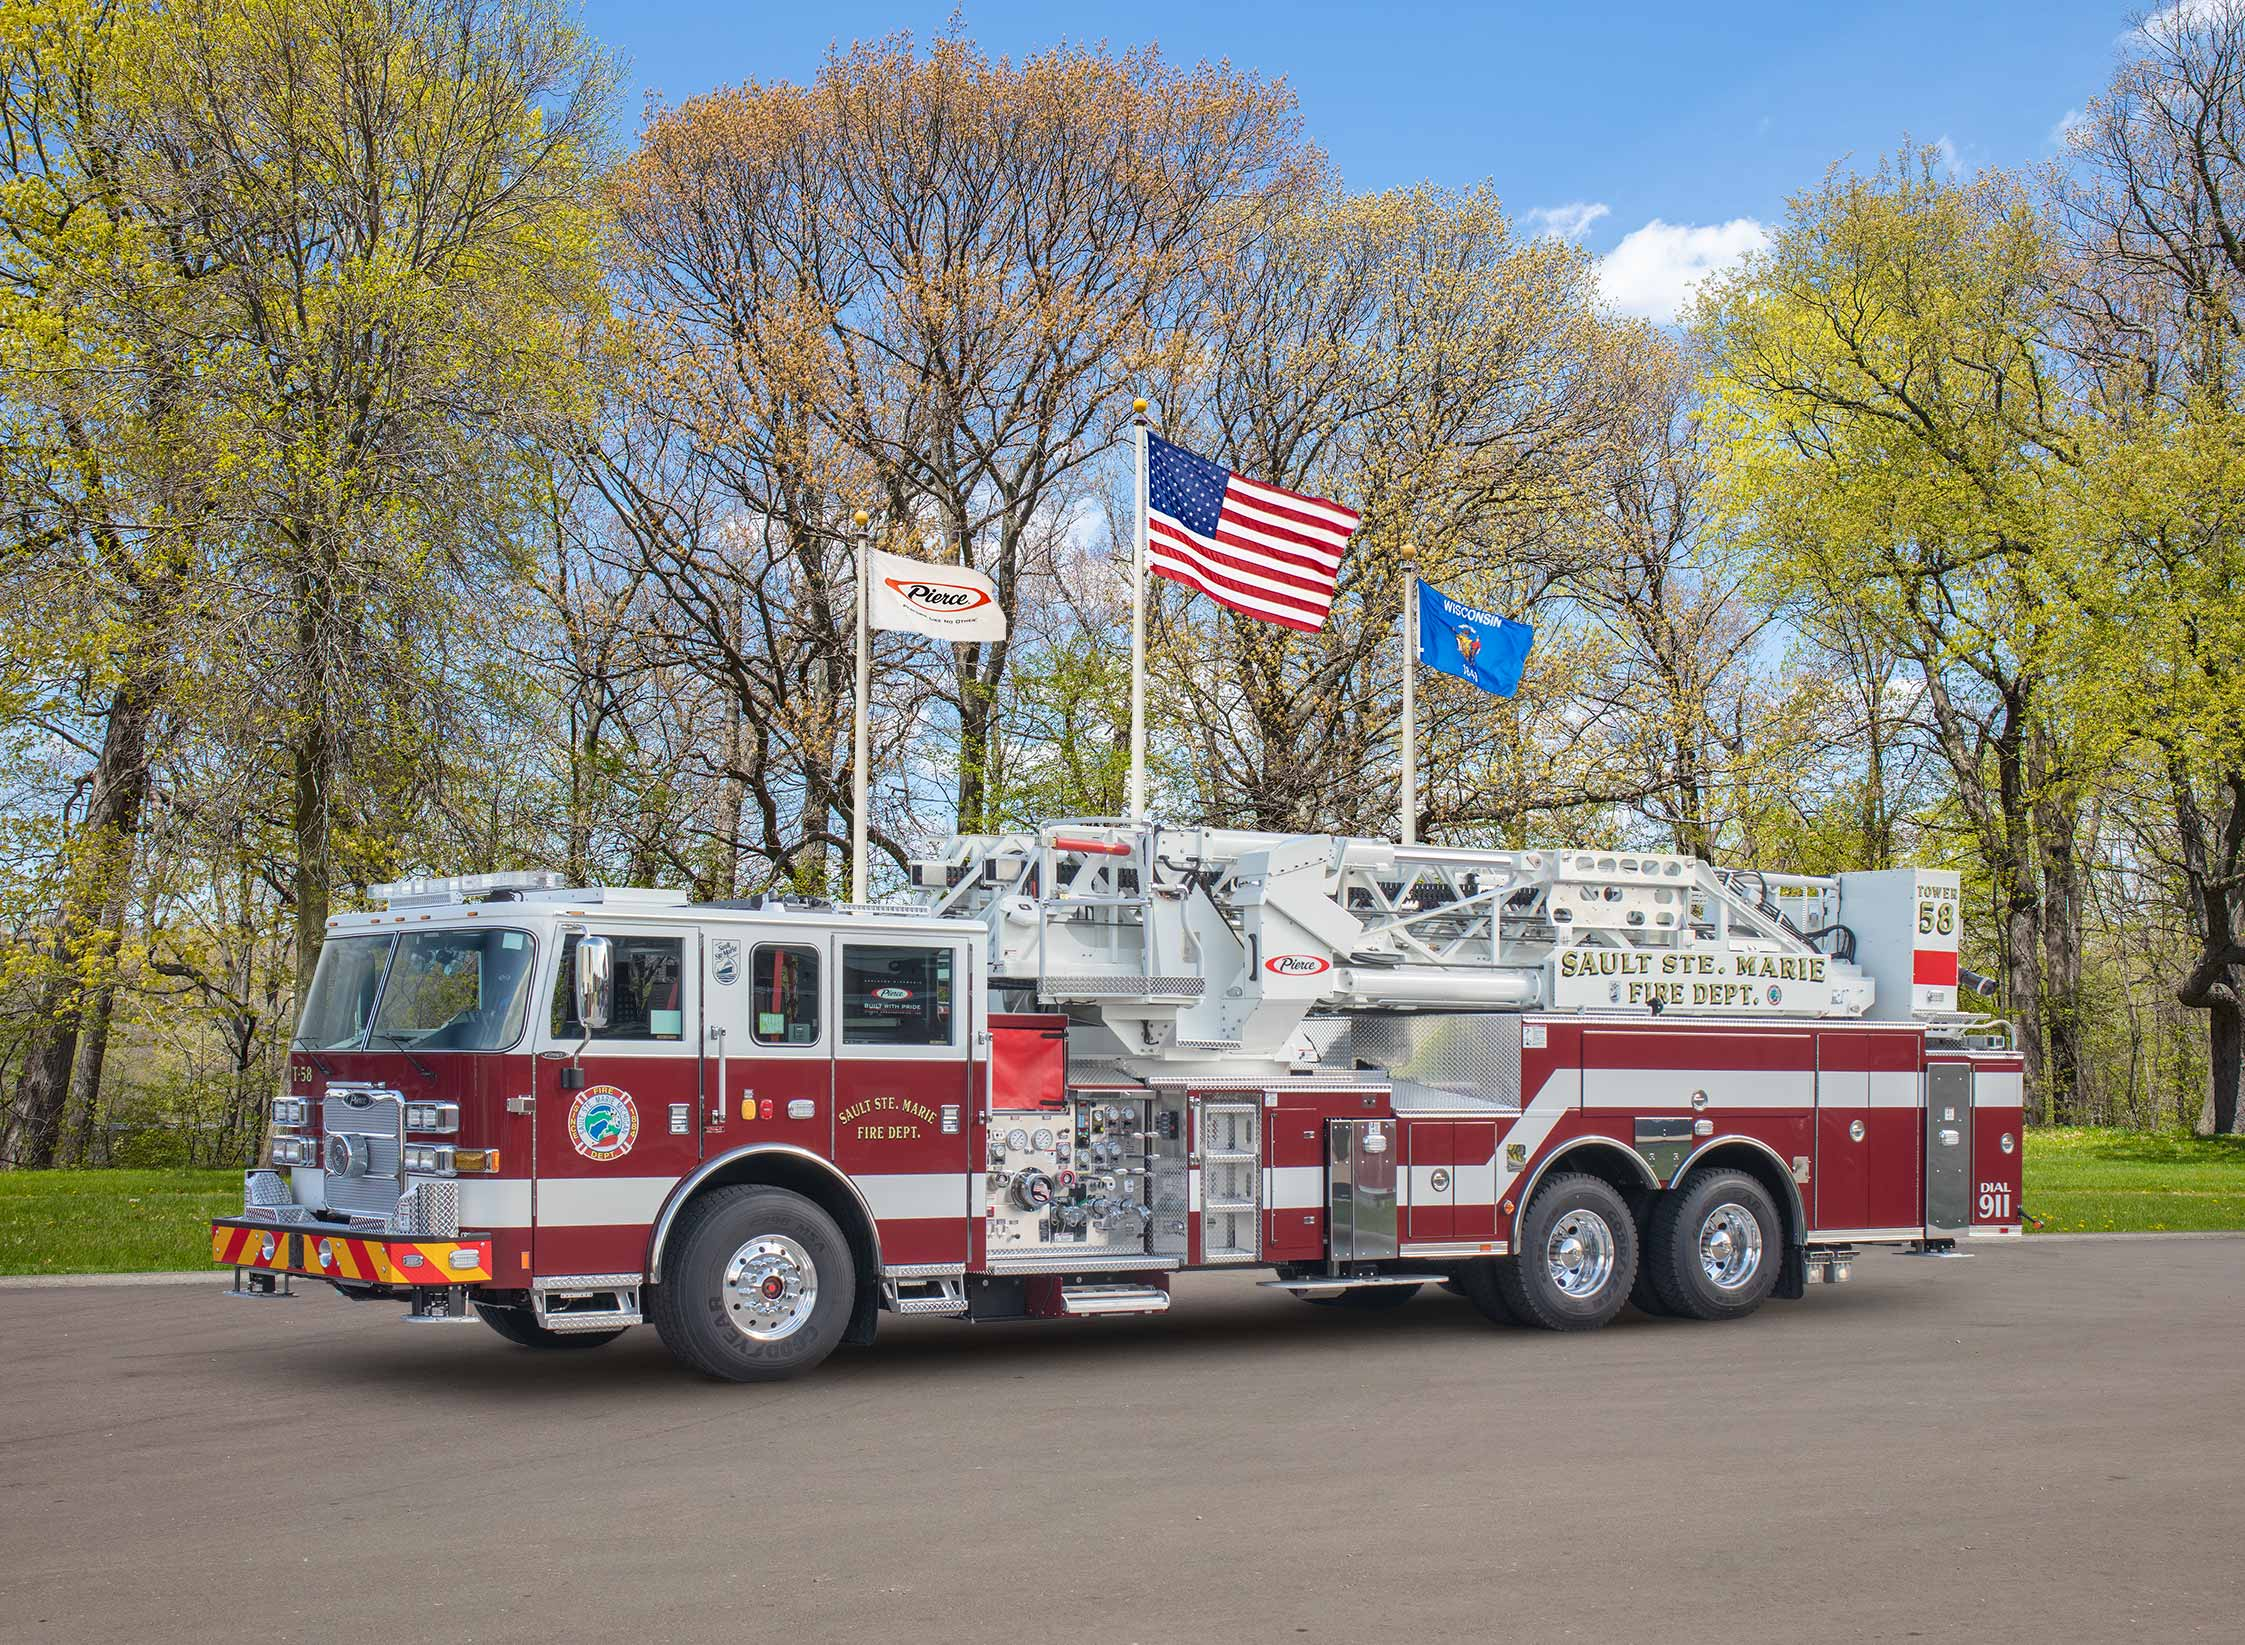 Sault Ste. Marie Fire Department - Aerial